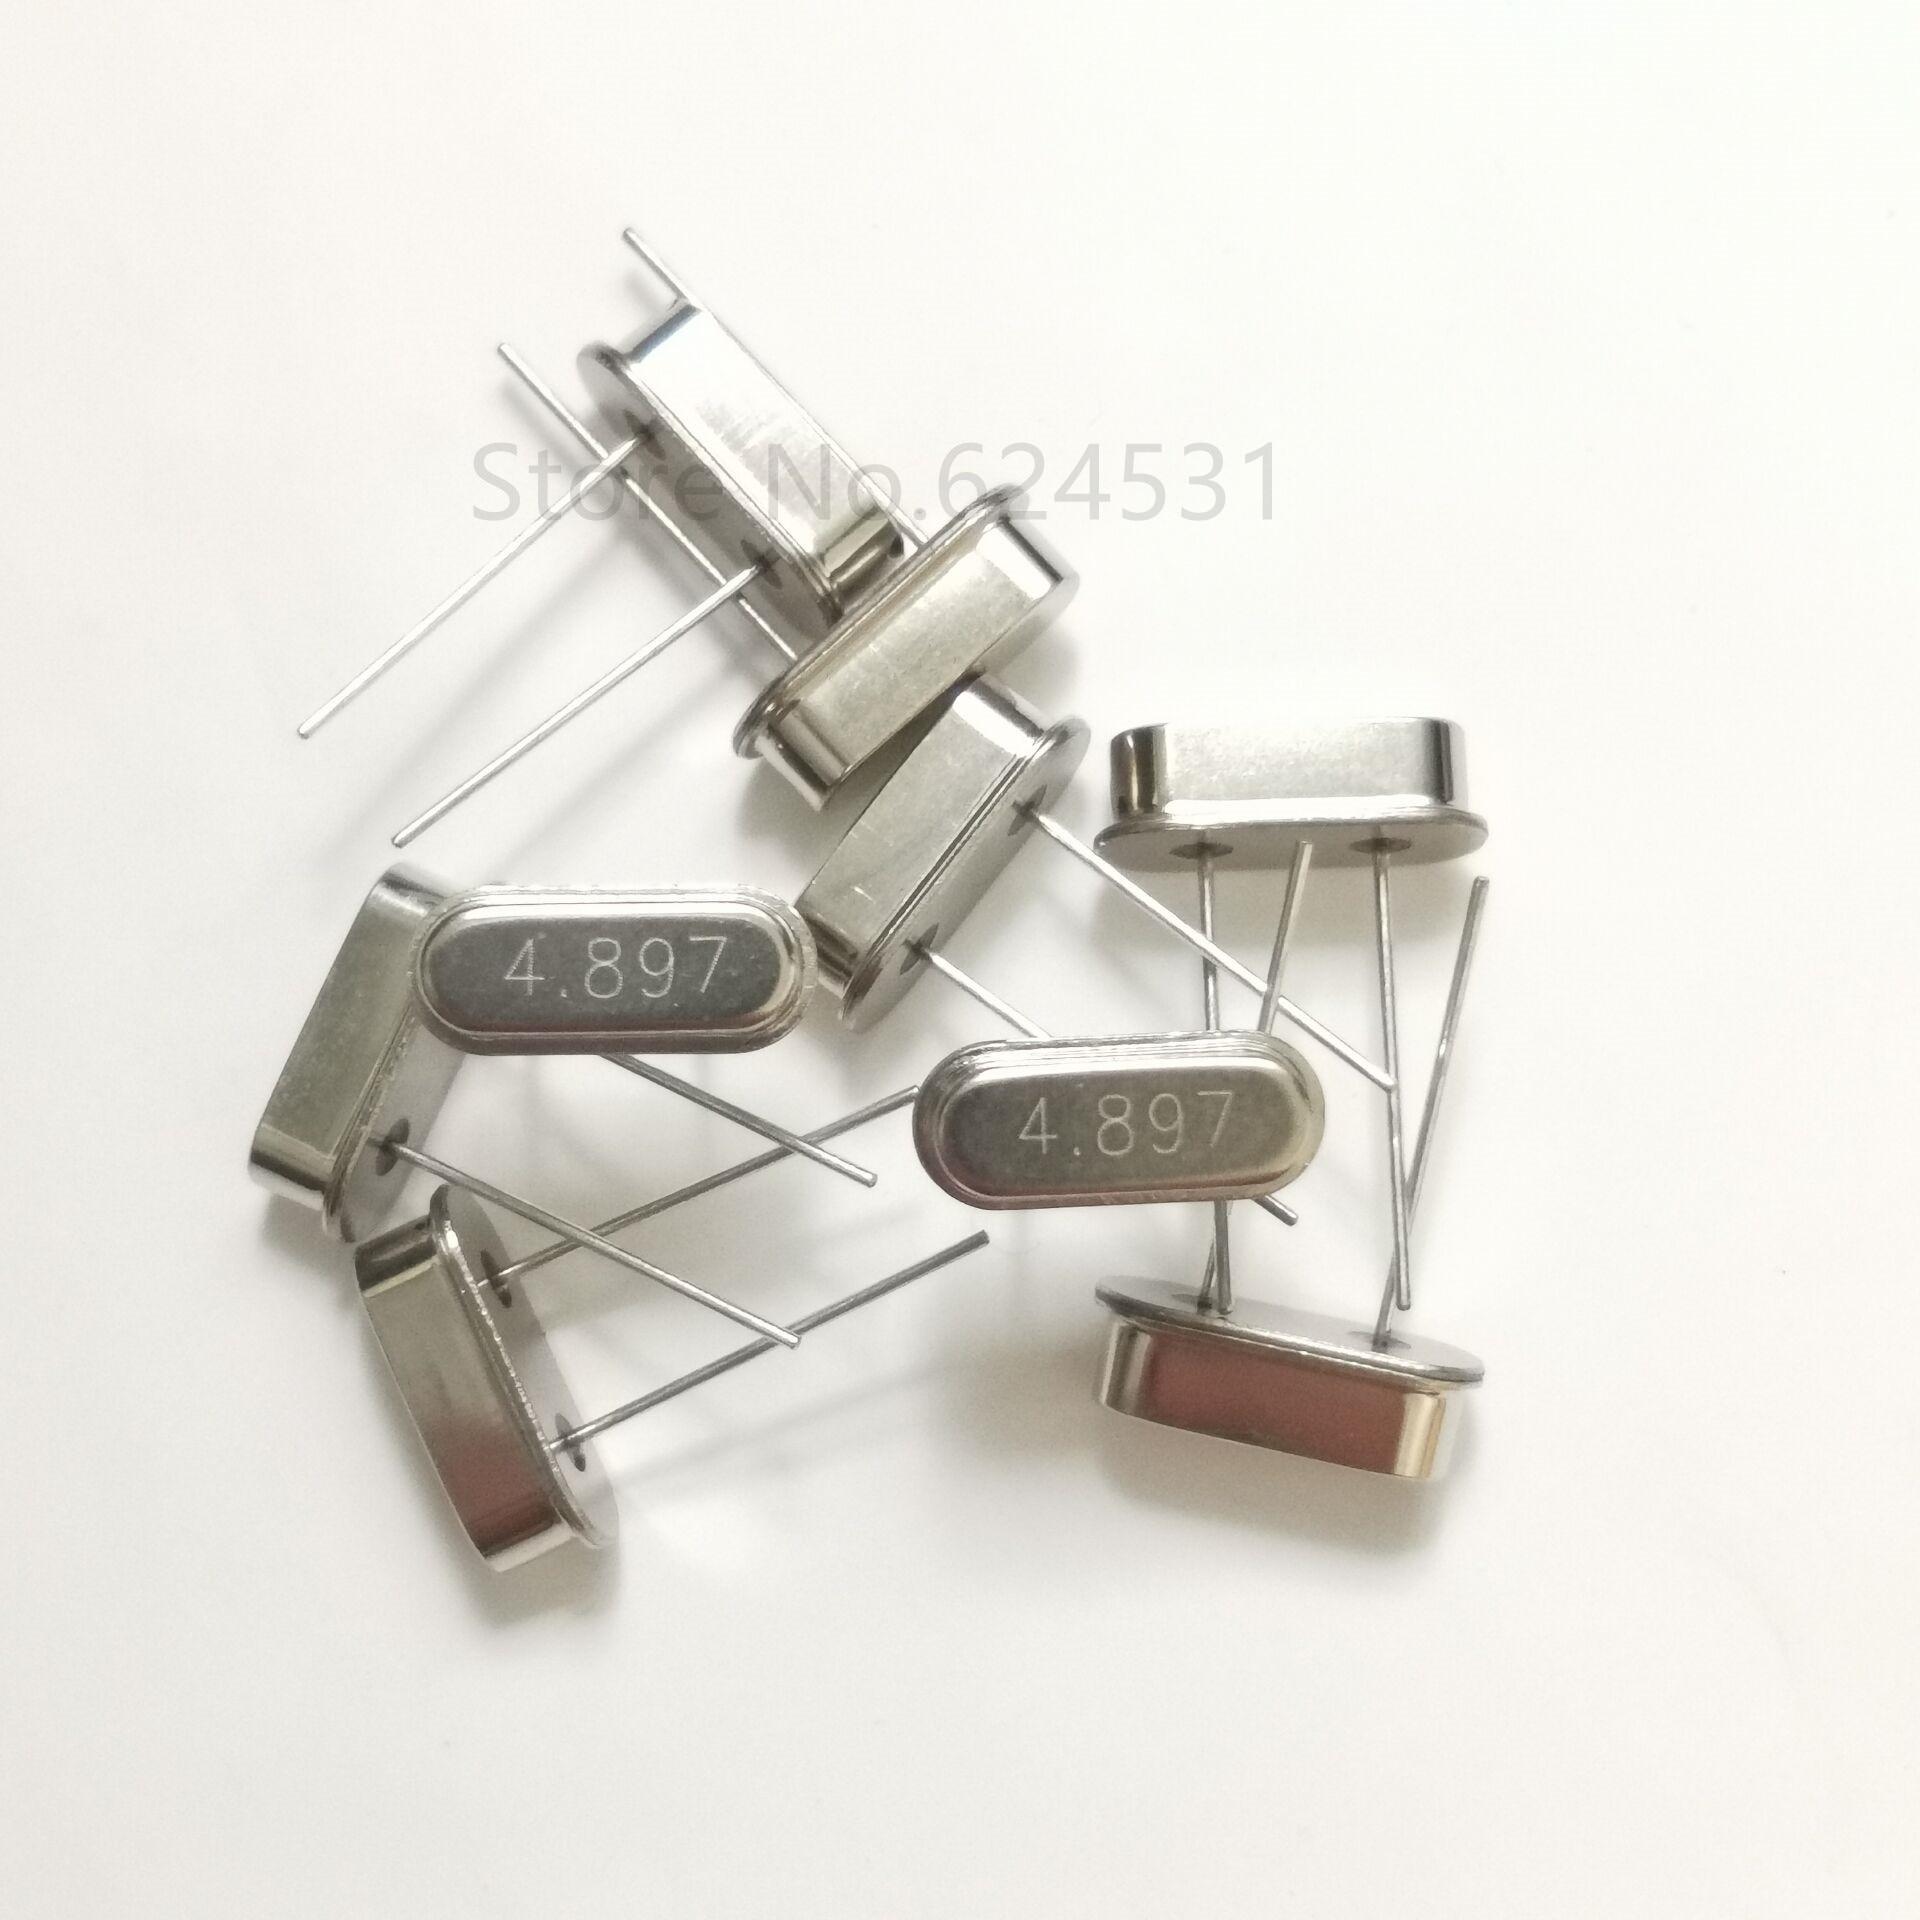 10pcs Crystal 4.897MHZ Inline Two Feet HC-49S Passive Crystal Resonator